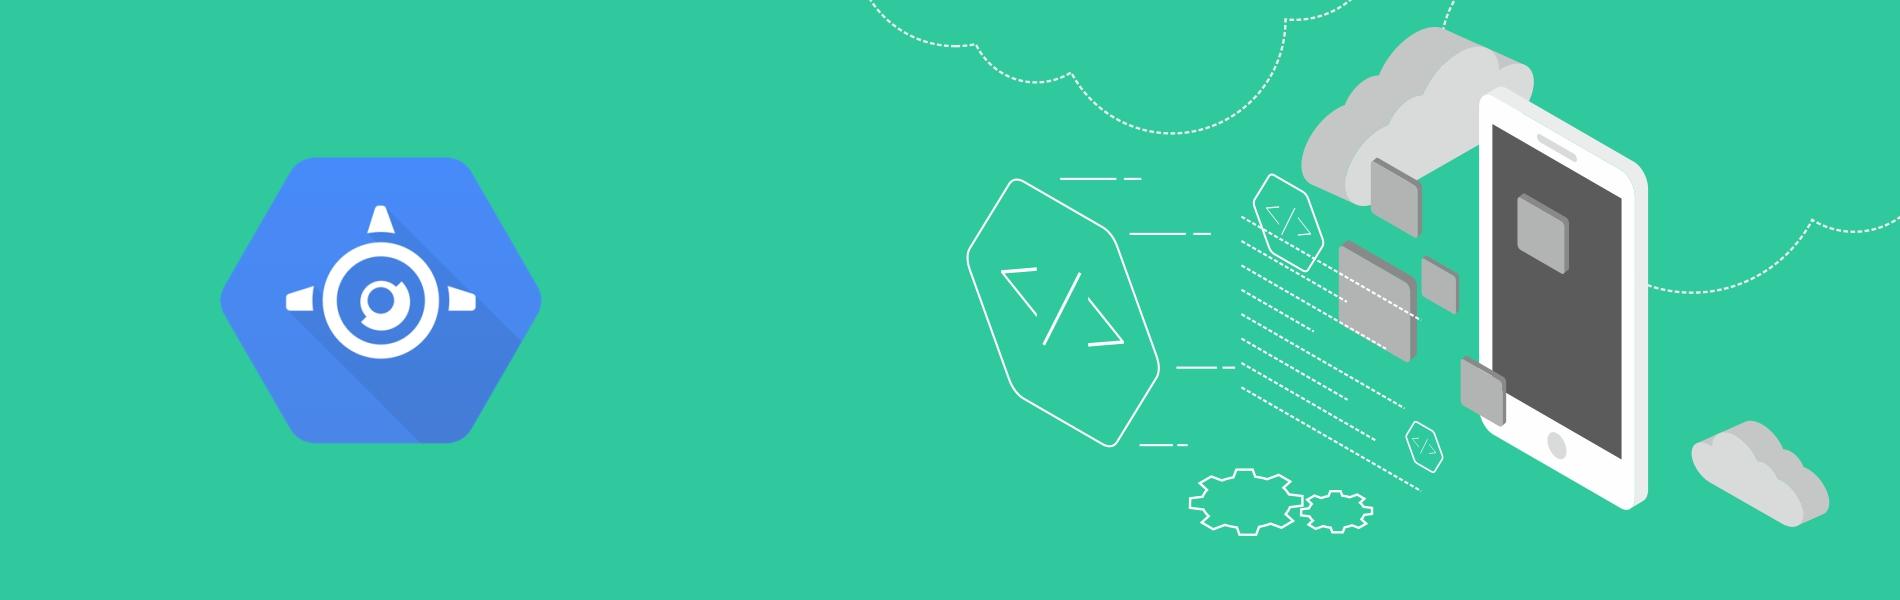 Blog-Header-Building-an-Application-with-Google-Cloud-App-Engine-1900x600